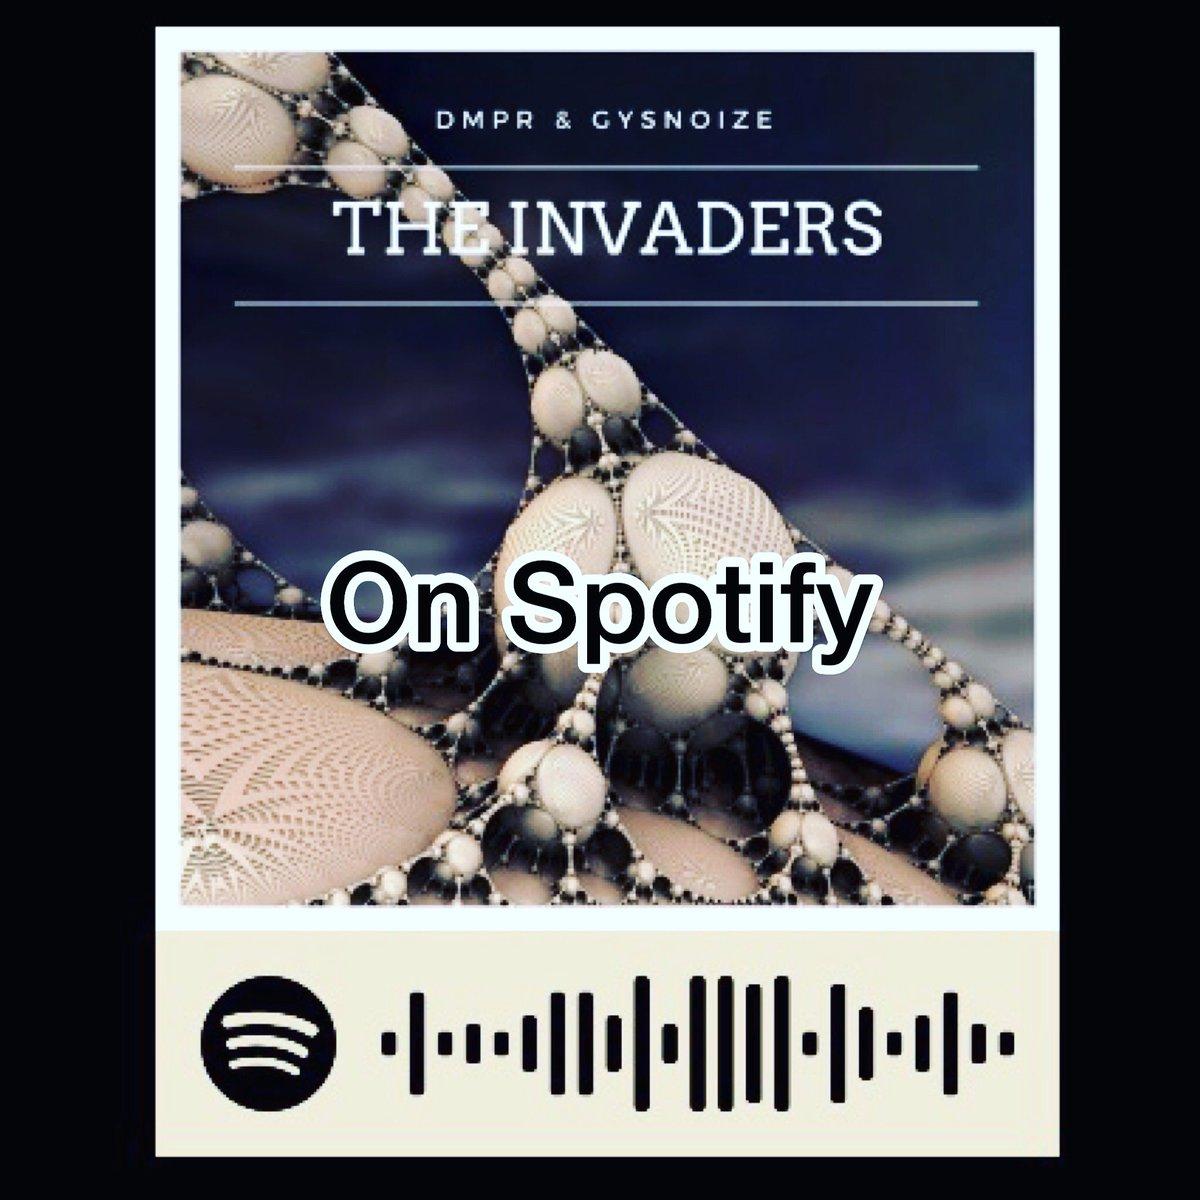 All ready available on @Spotify #dnb #drumandbass #drumandbassmusic #topdnb #topdrumandbass #NewMusic #NowPlaying #noelisten #Spotifypic.twitter.com/BiYu3oQRcA